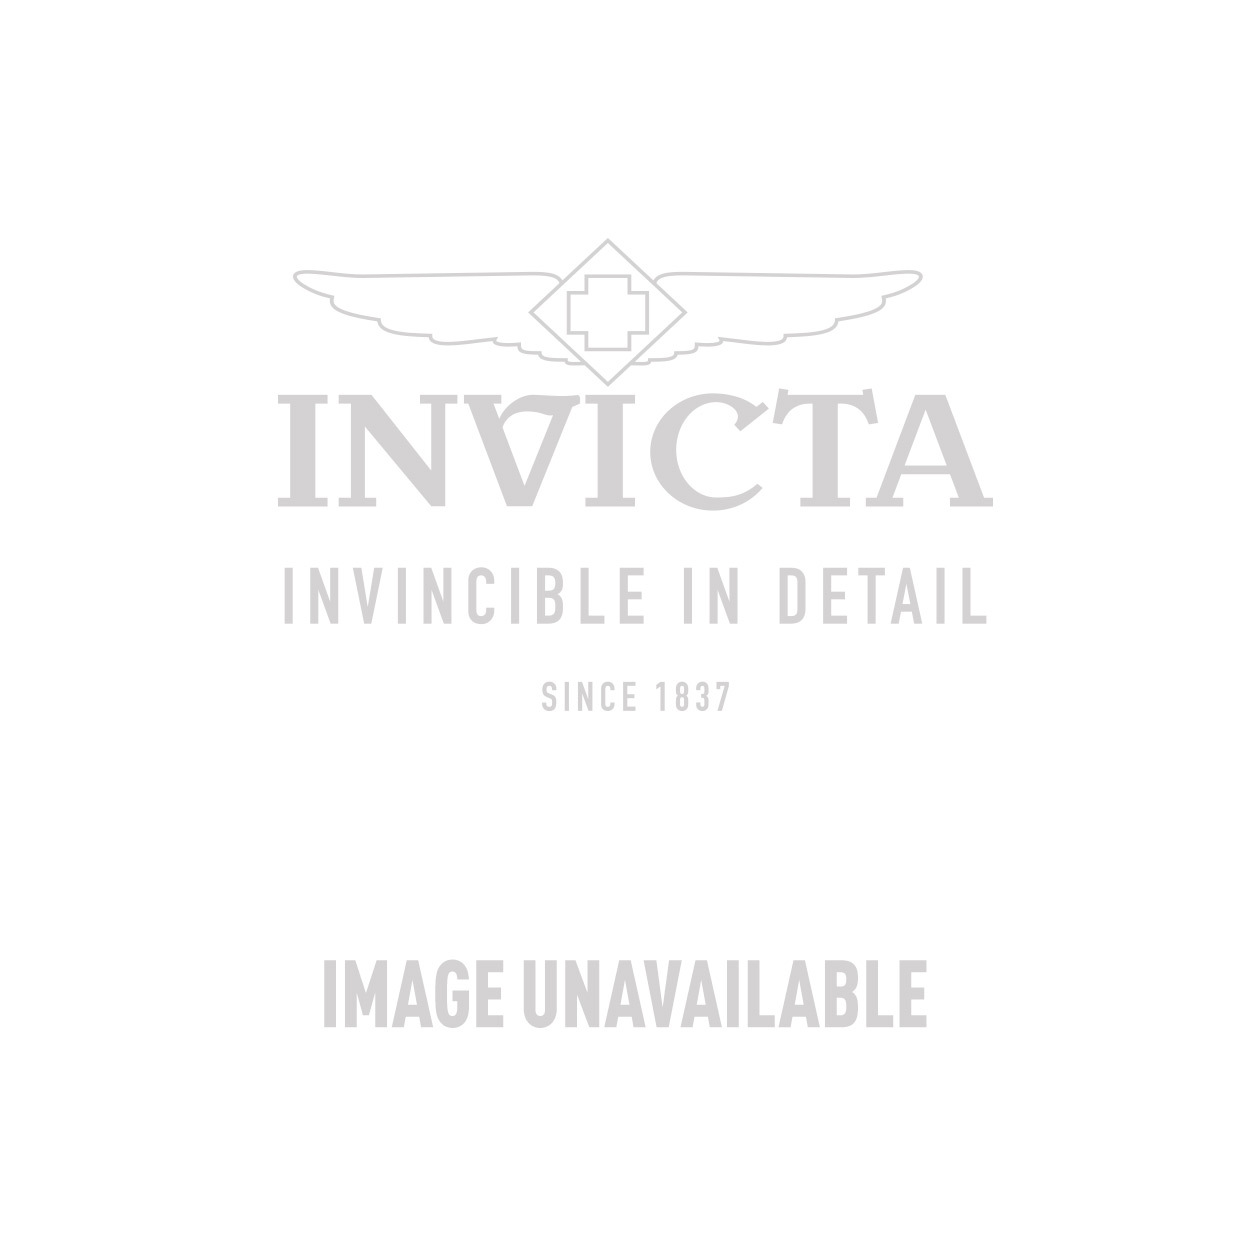 Invicta Speedway Quartz Watch - Stainless Steel case Stainless Steel band - Model 17311